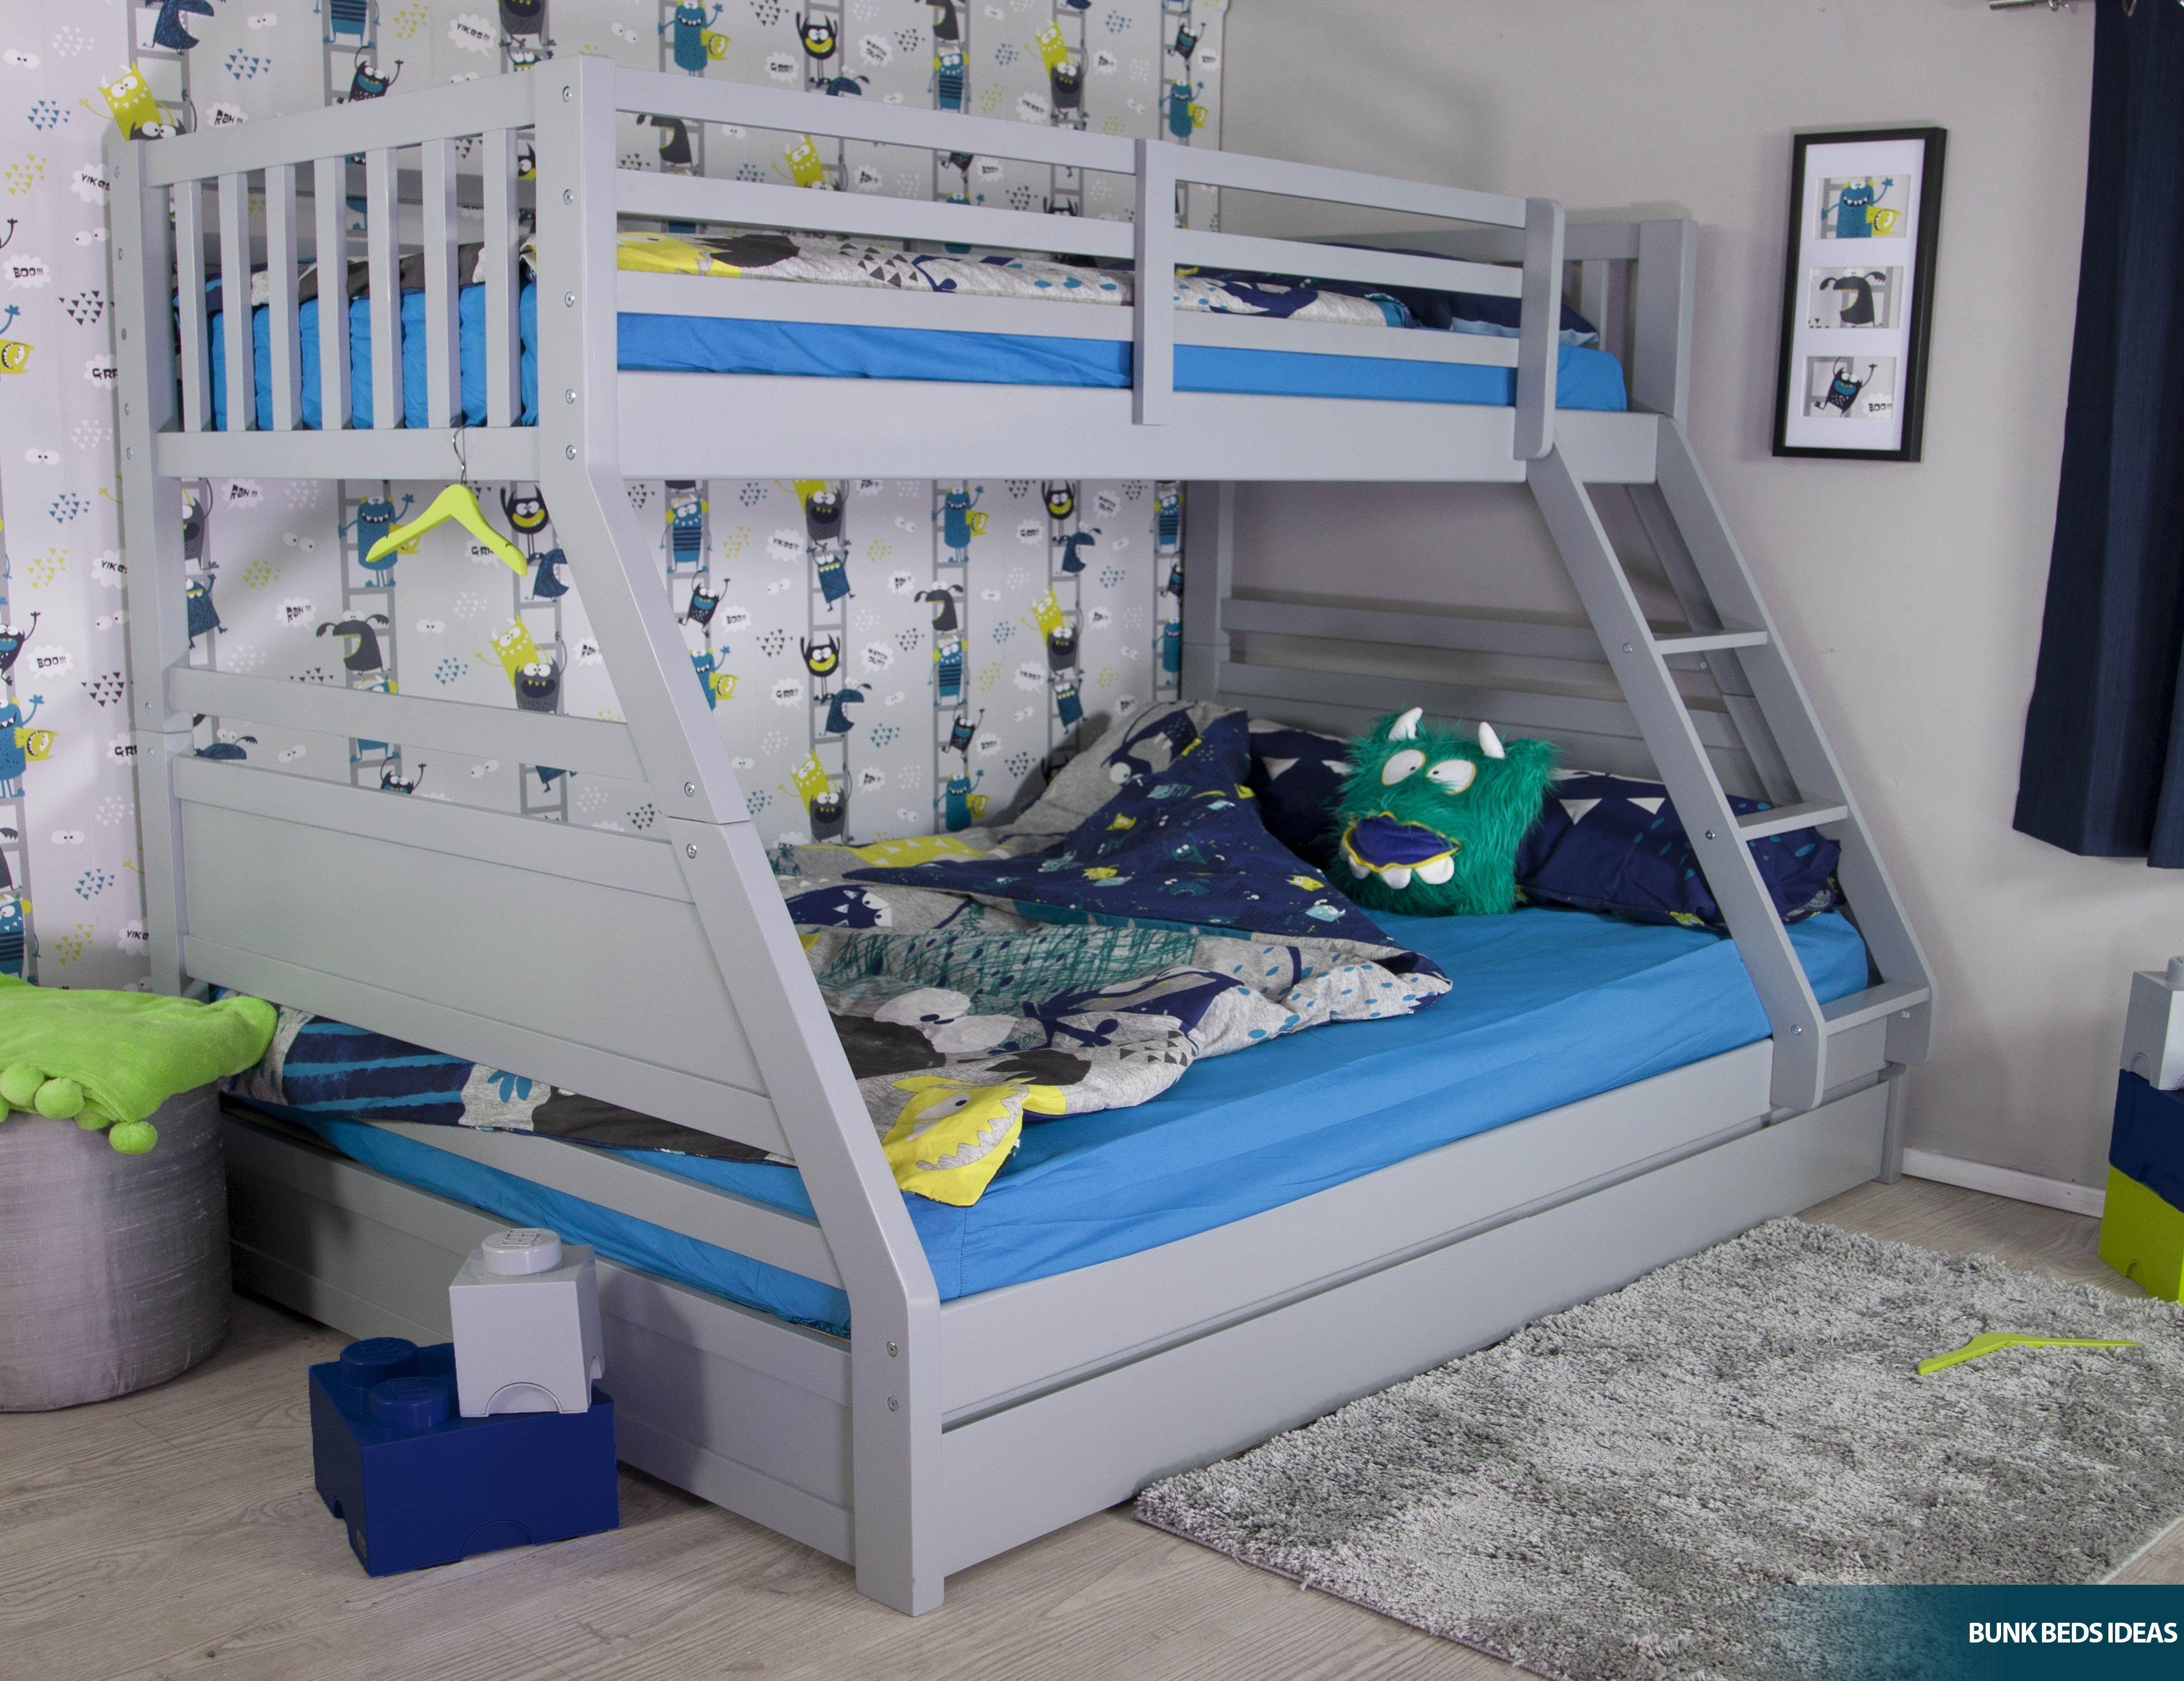 Bunk Beds With Desk Bunk Beds In Minecraft Bunk Beds For Sale In Gauteng Bunk Beds Triple Sleeper Bunk Bed Kids Bunk Beds